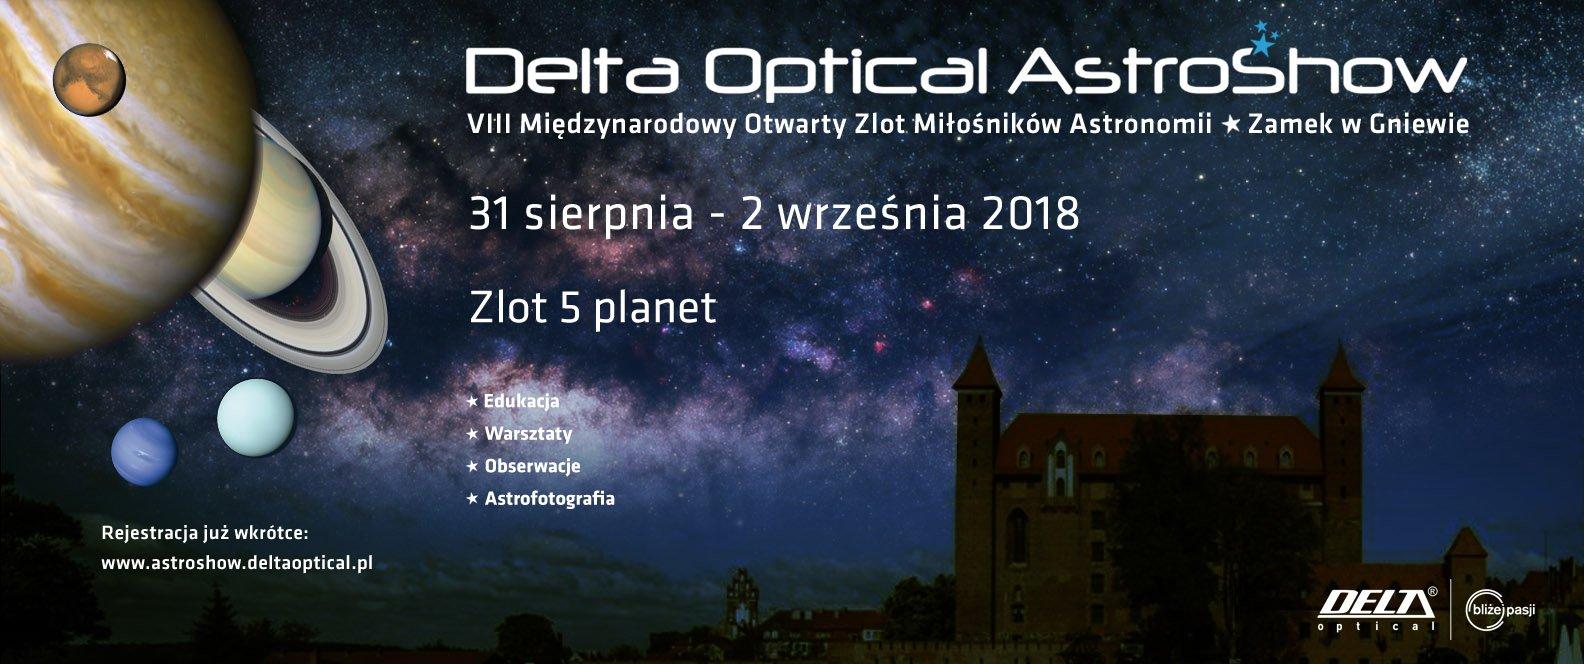 Delta Optical AstroShow @ Gniew | pomorskie | Polska